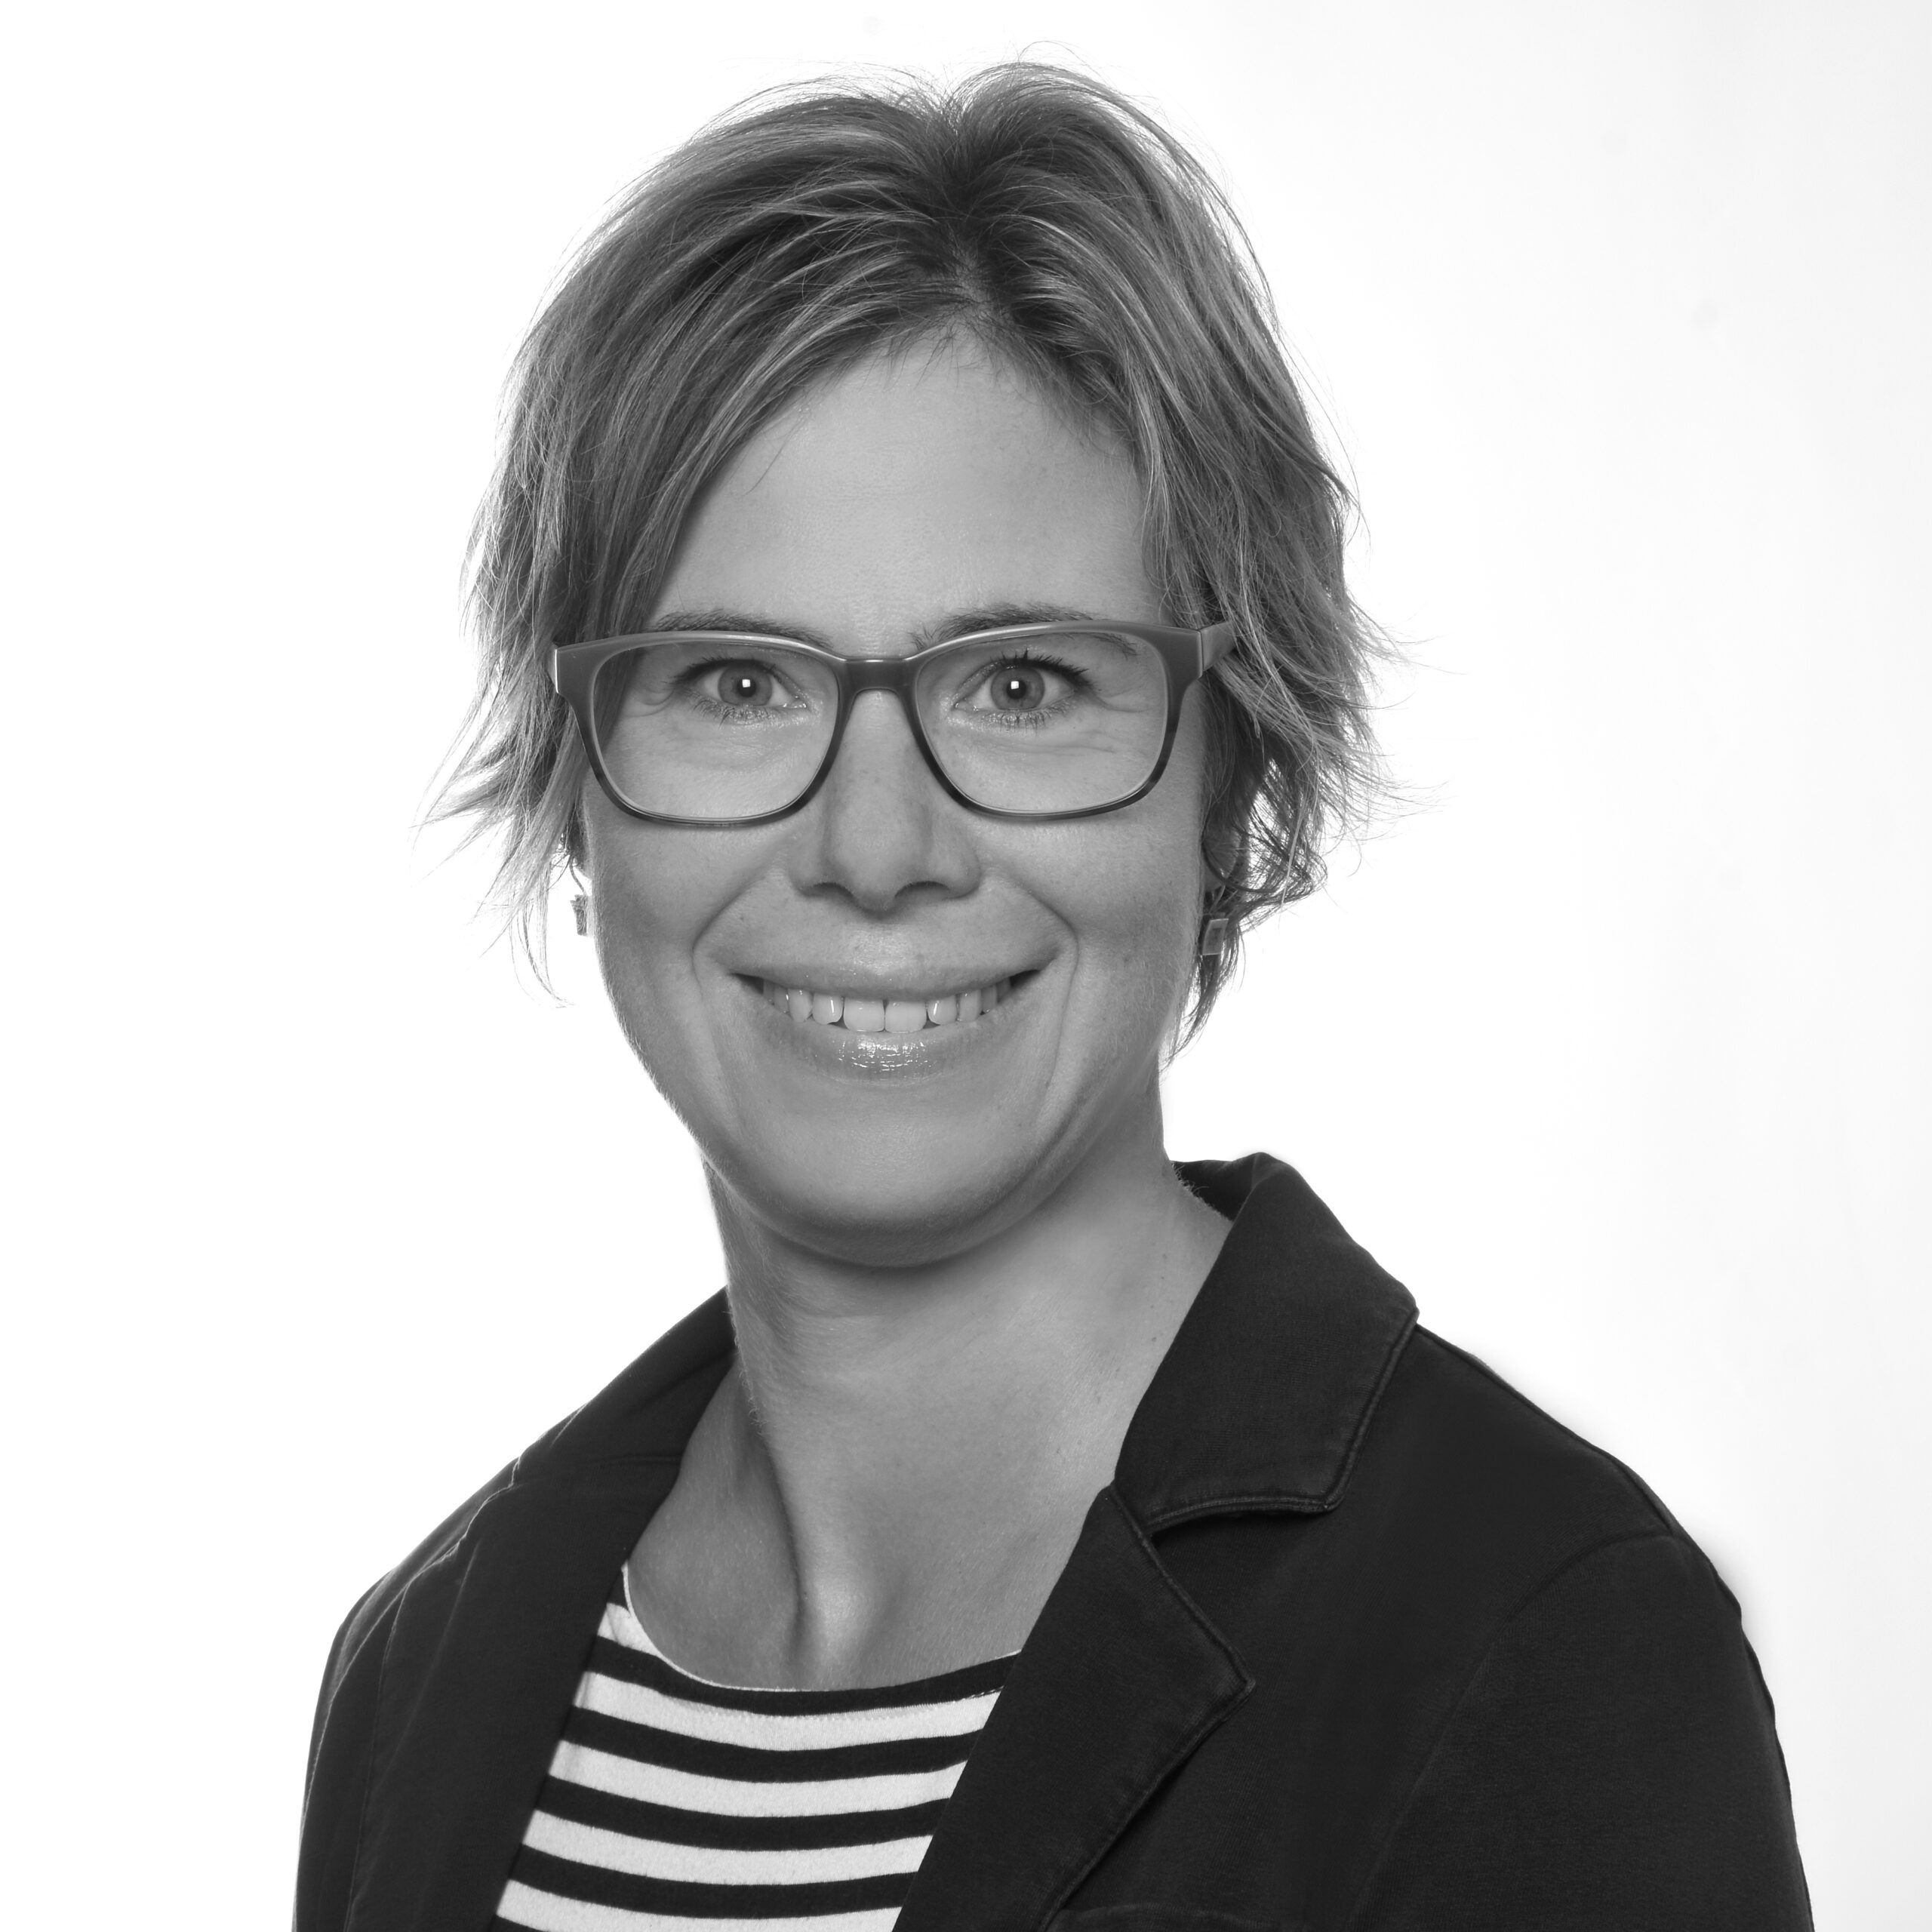 Katrin Große